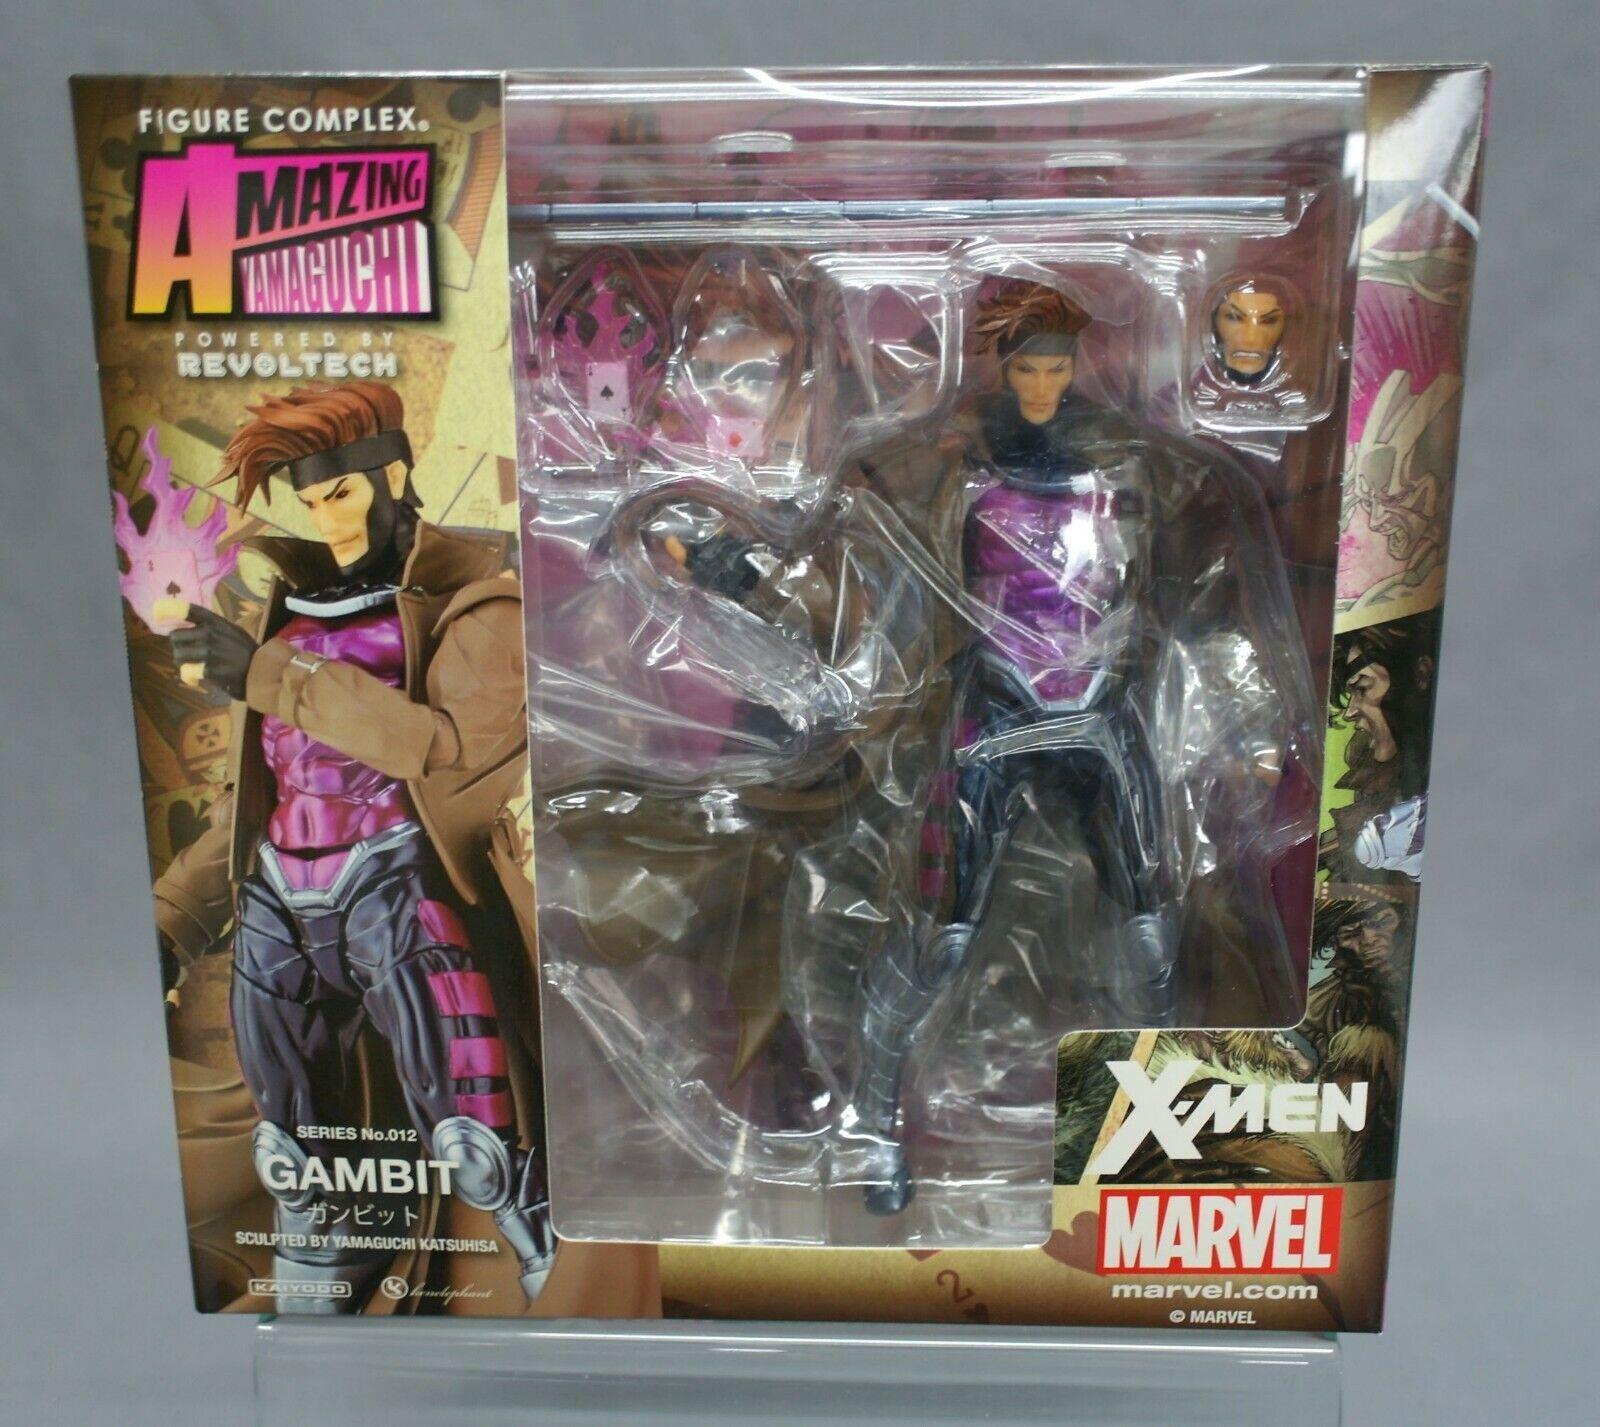 Marvel Amazing Yamaguchi Revoltech GAMBIT X-MEN KAIYODO Complex Action Figure KO